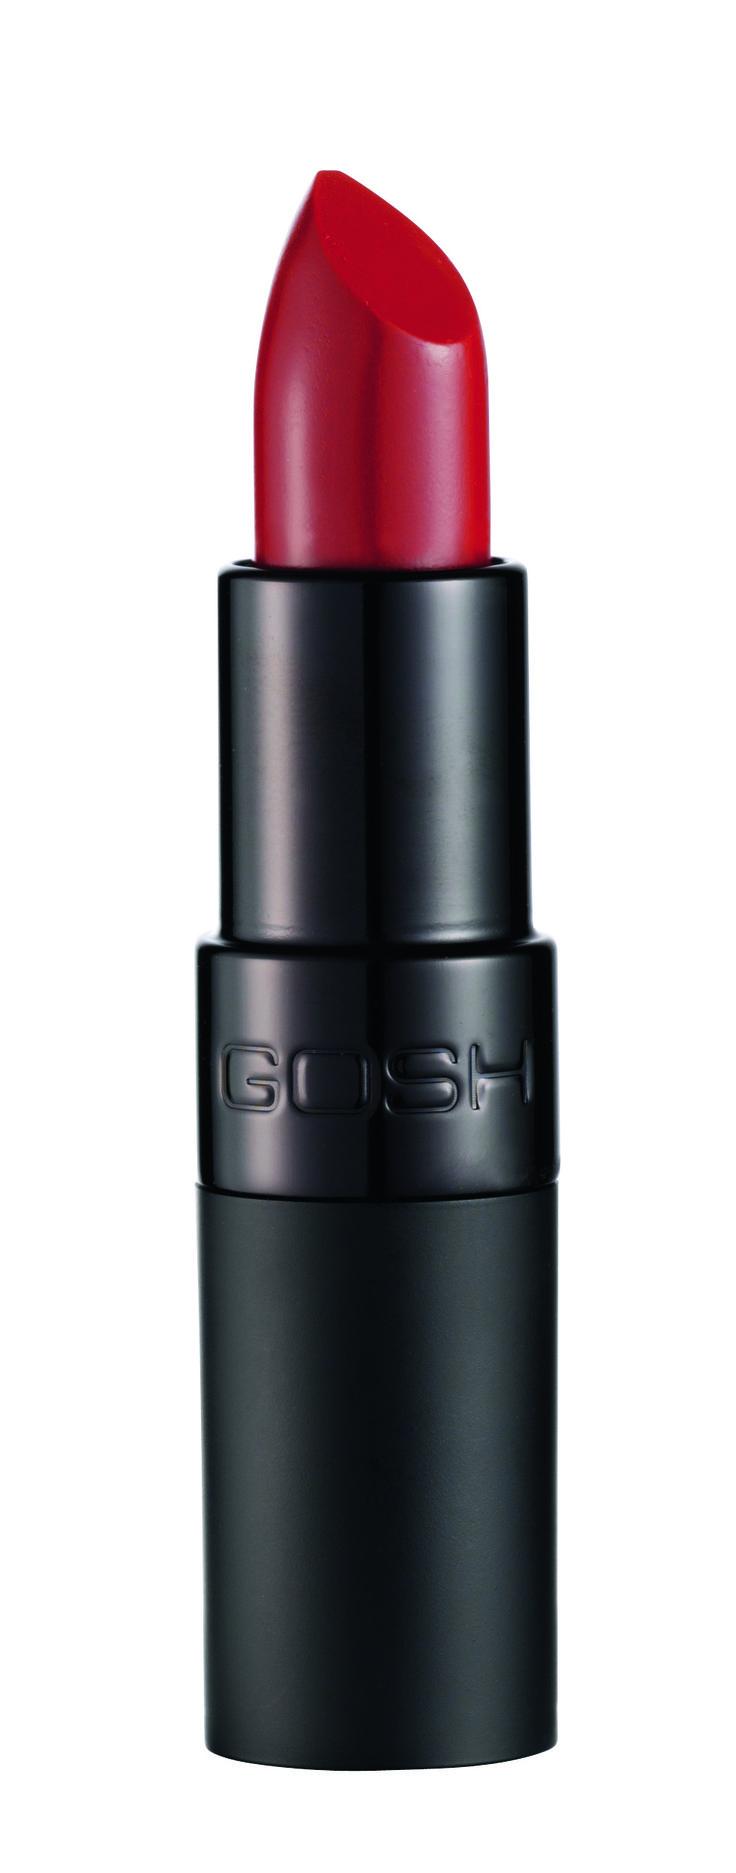 Gosh Velvet Touch Lipstick 60 Lambada